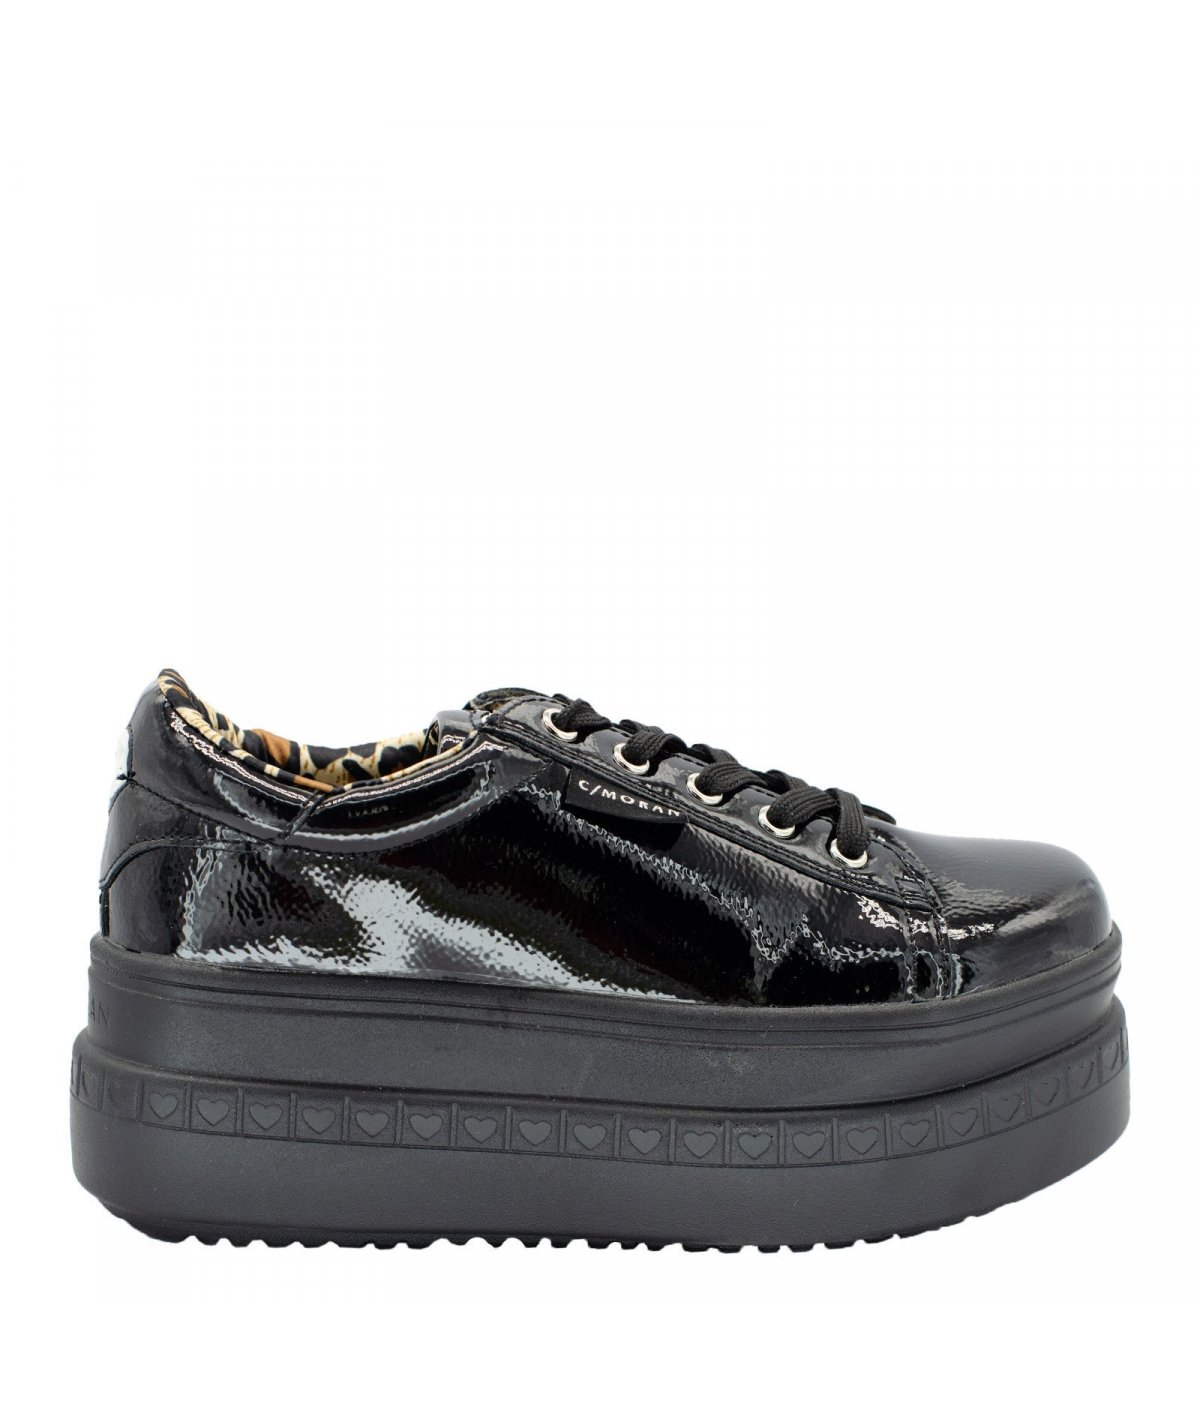 Zapatillas Mujer 332 Richato